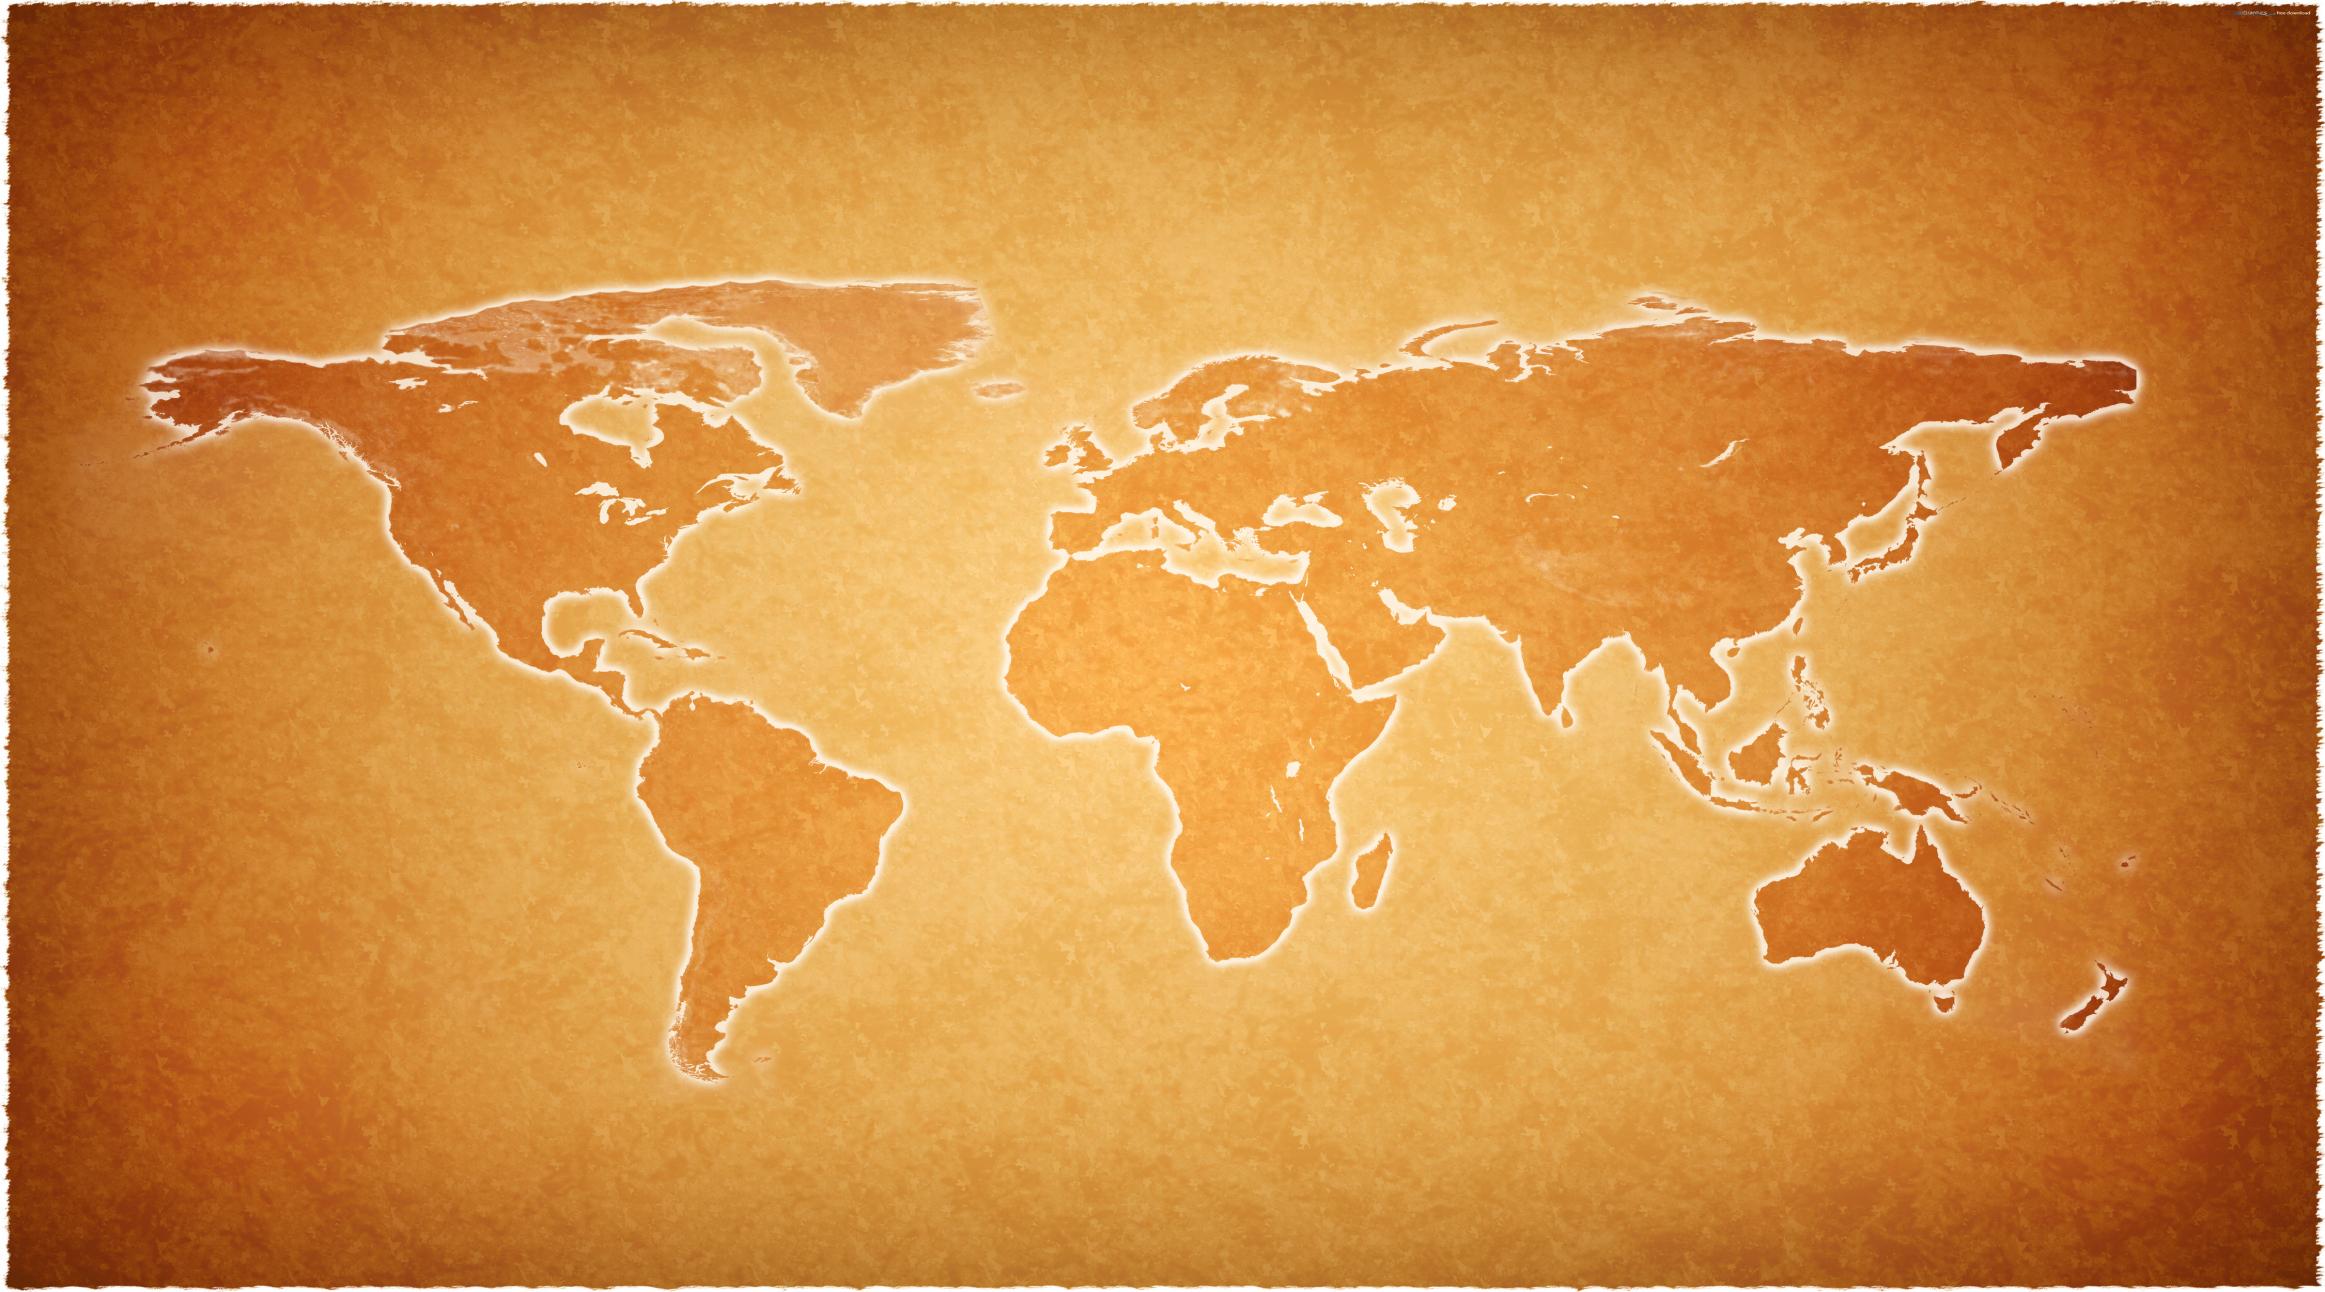 Orange Strategy at Work Internationally